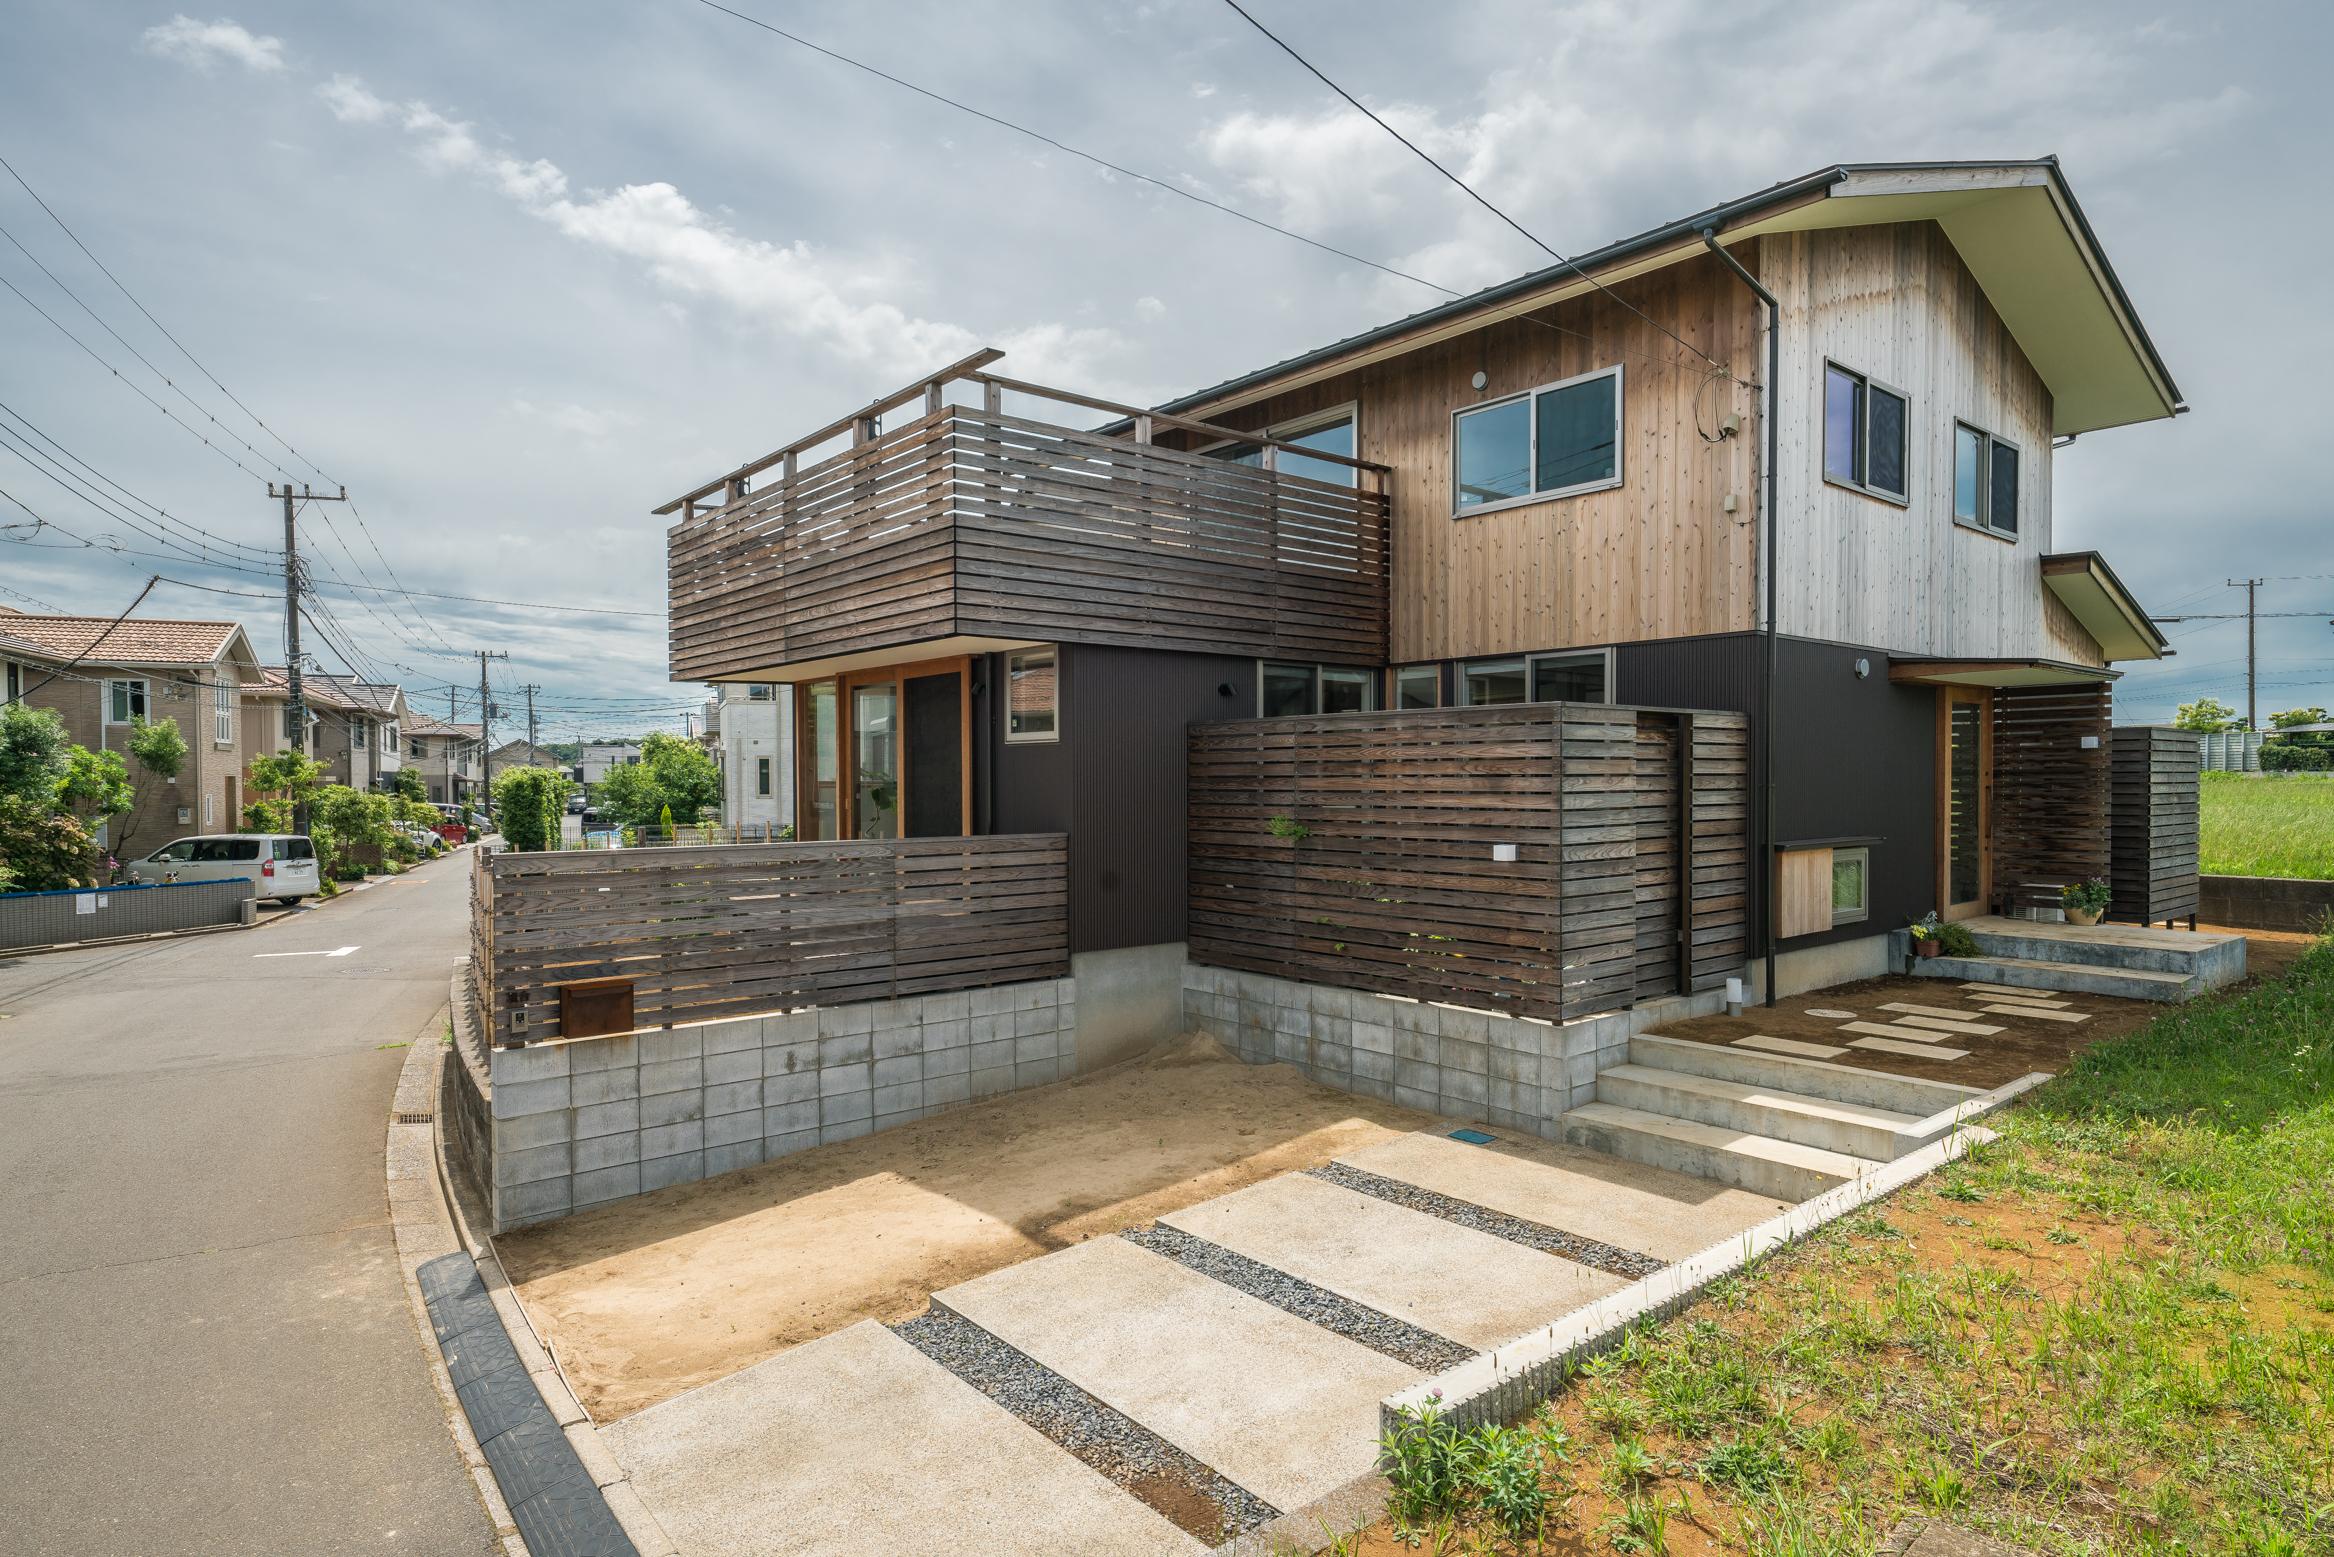 20170702四街道の家-02.jpg